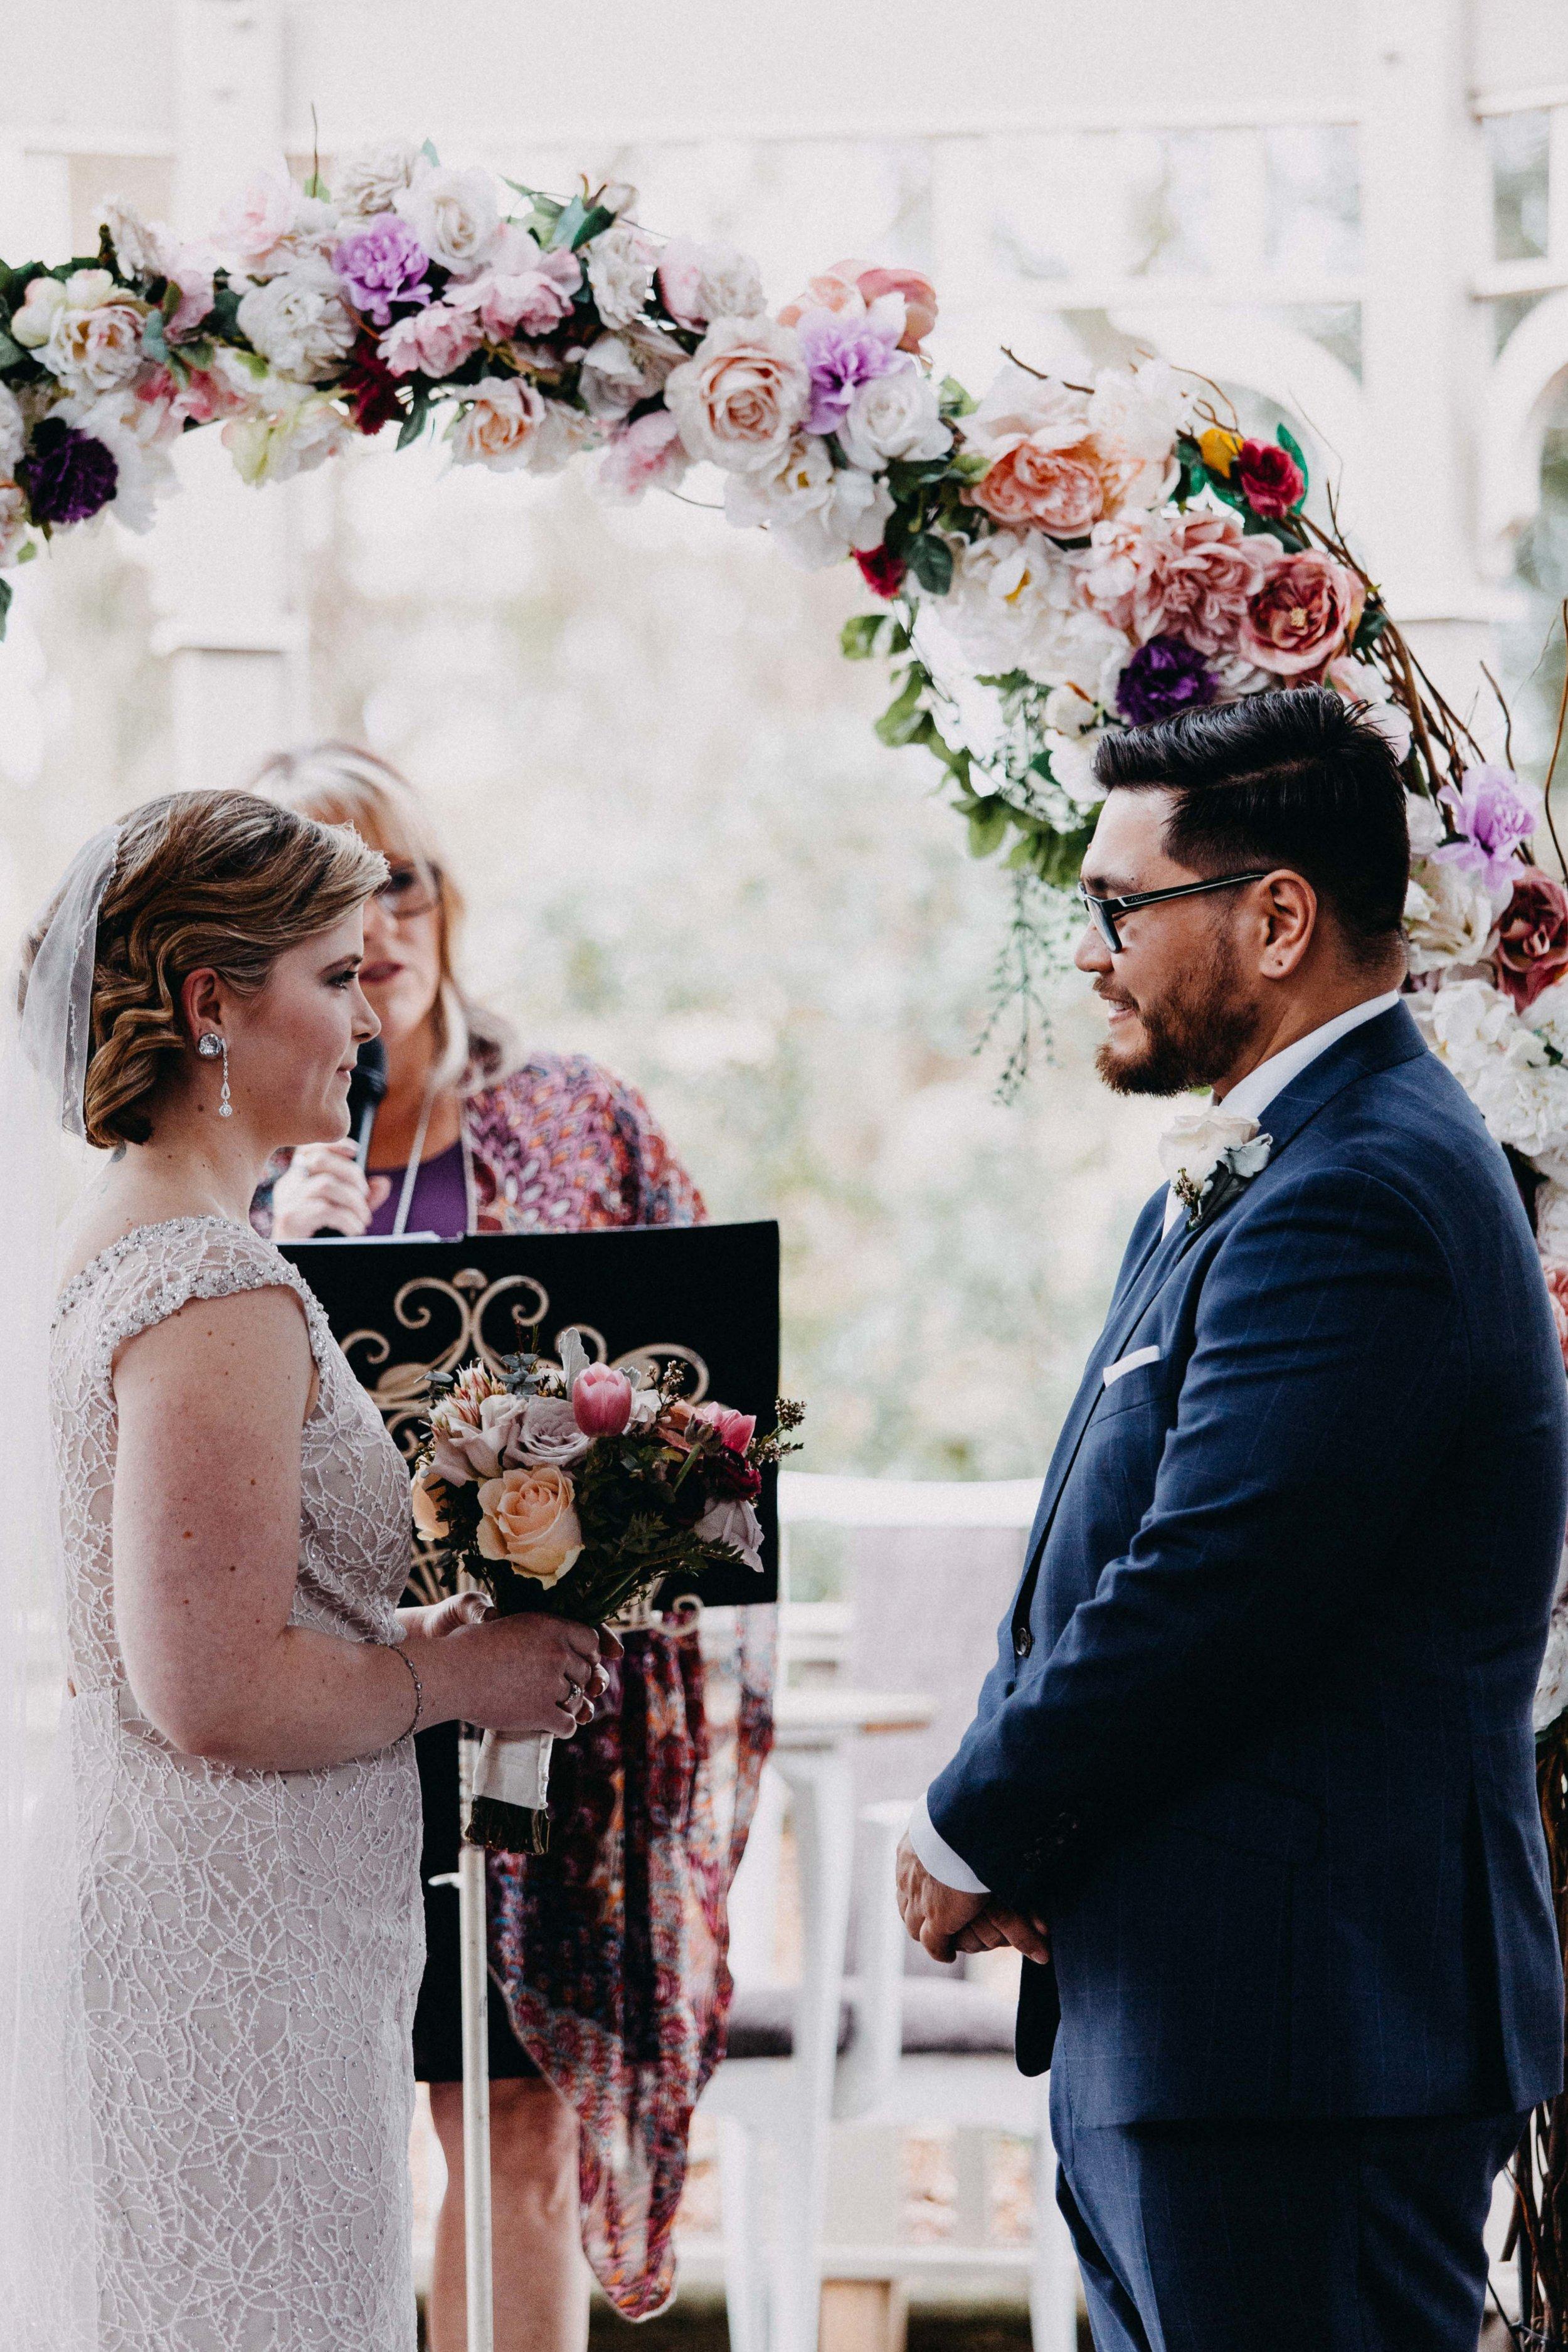 appin-house-wedding-macarthur-www.emilyobrienphotography.net-72.jpg